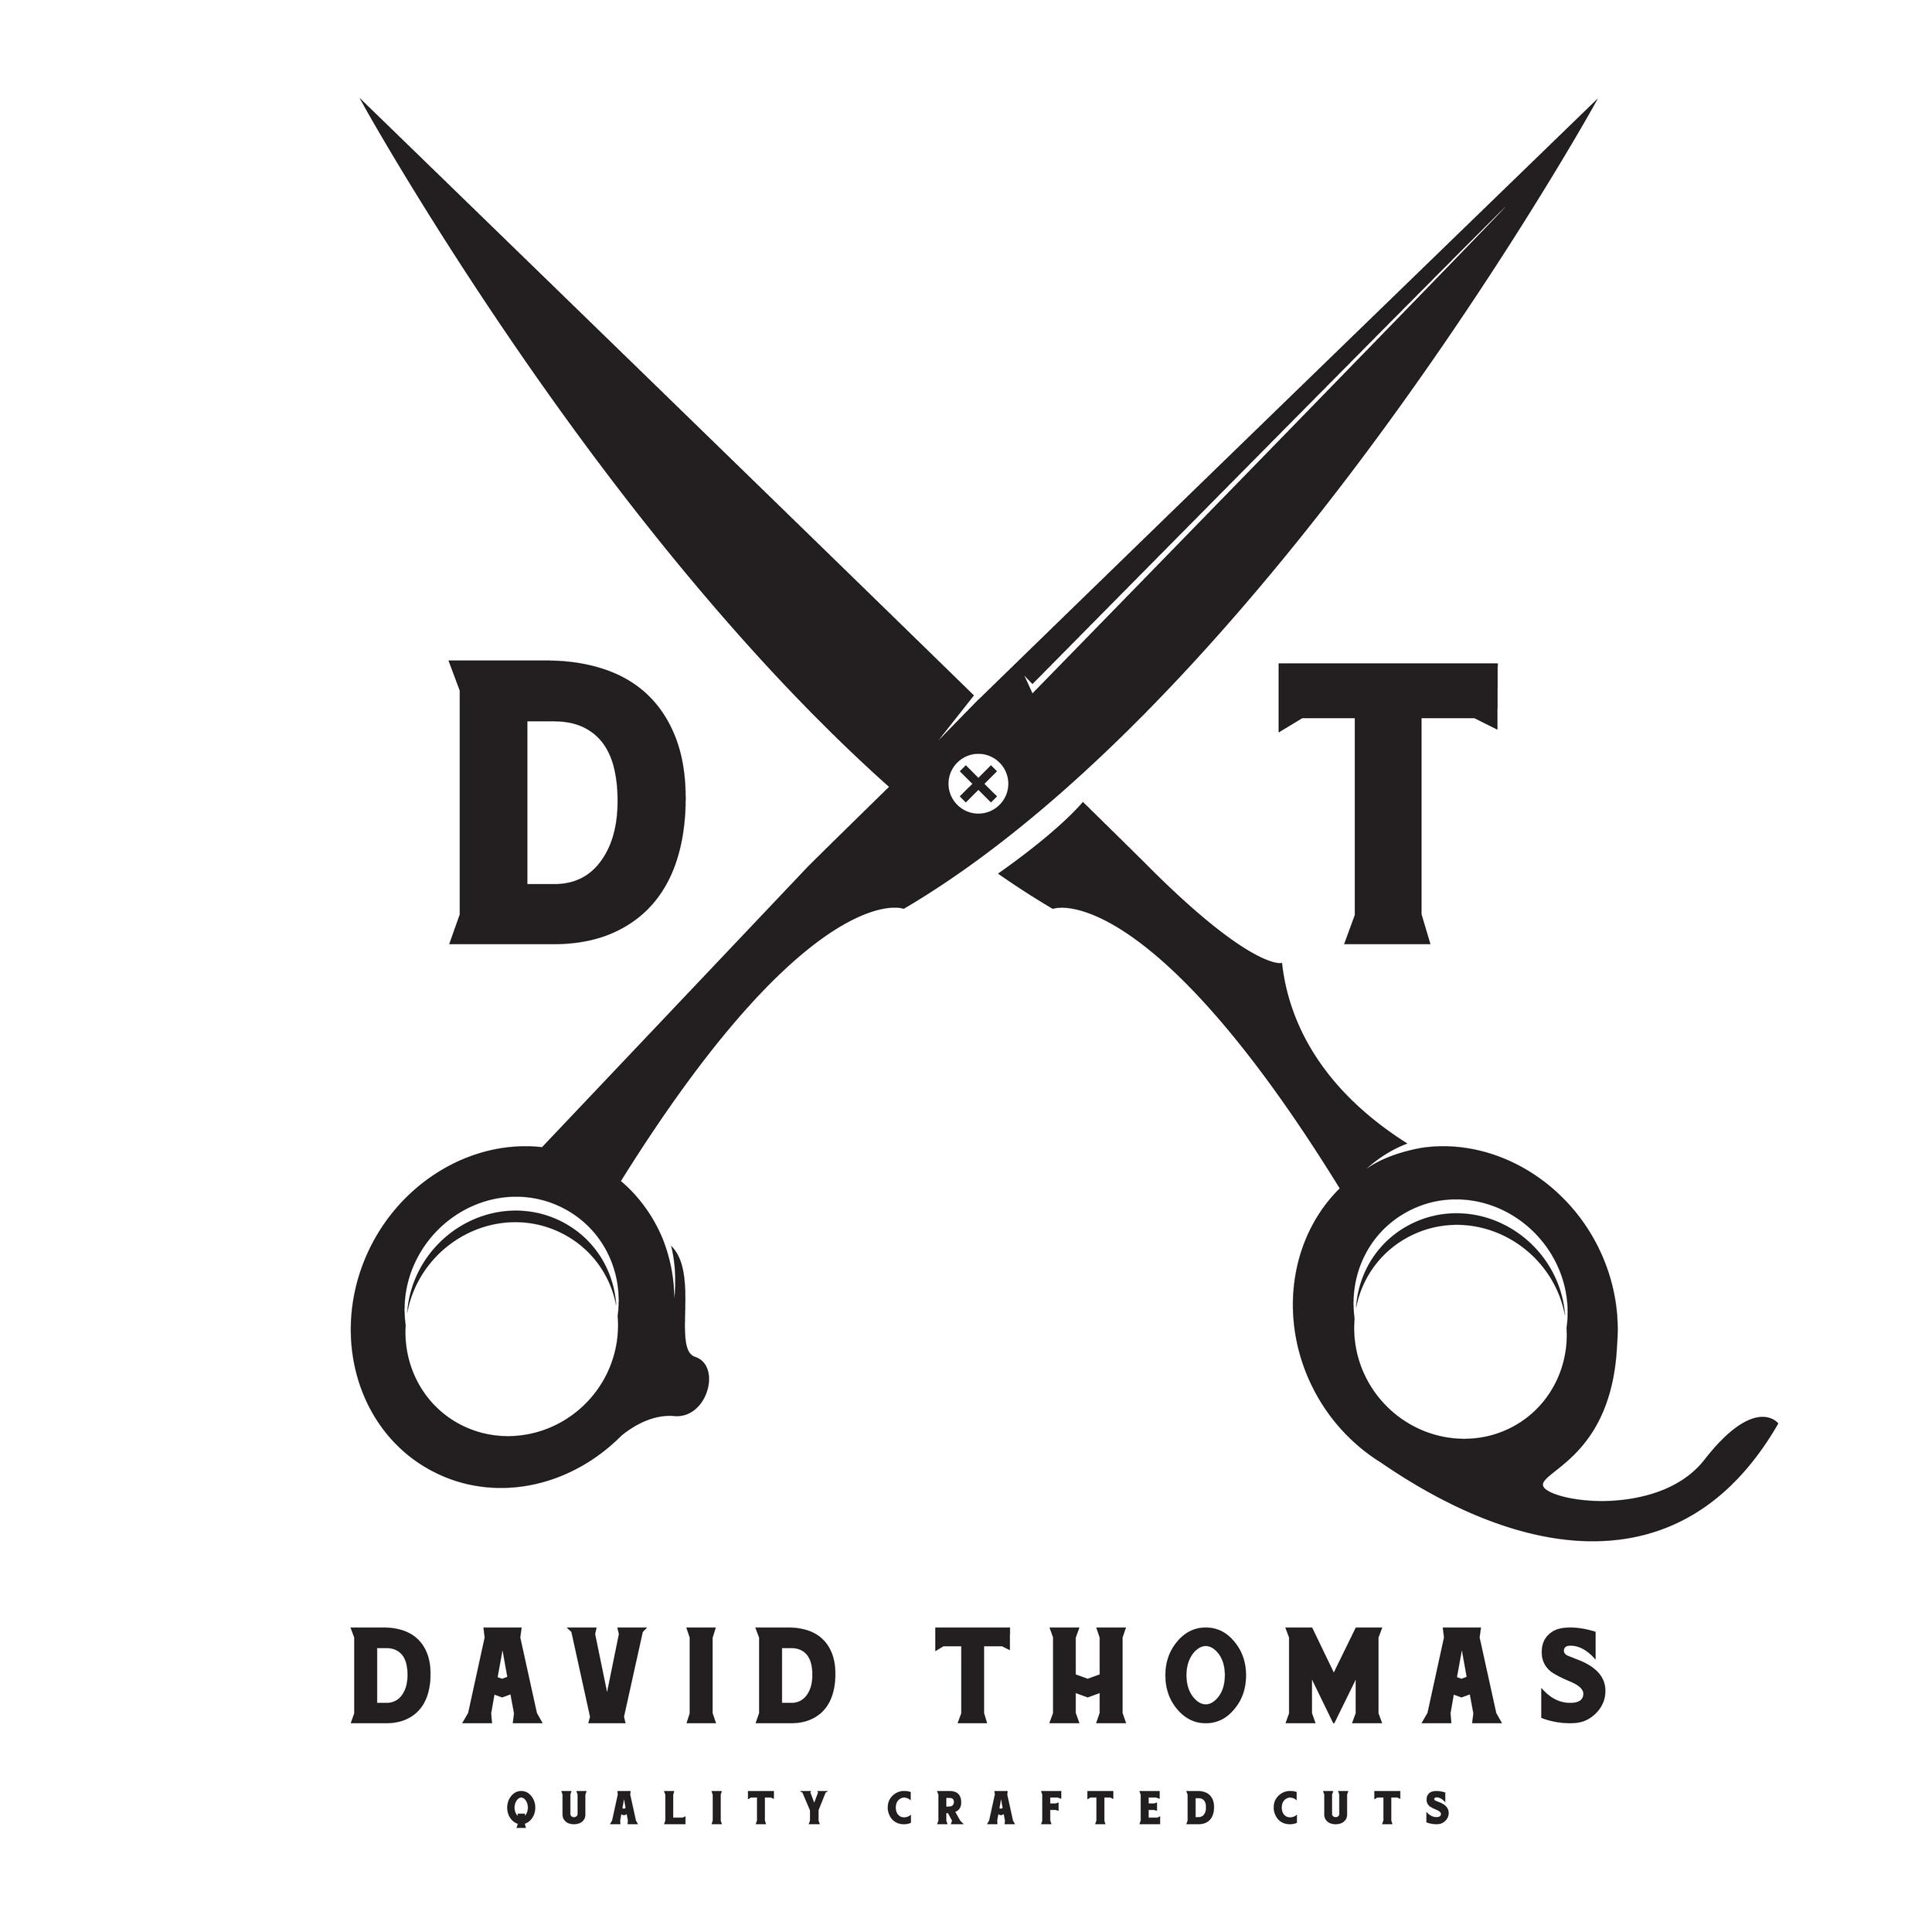 DavidThomas_Logo_2.jpg